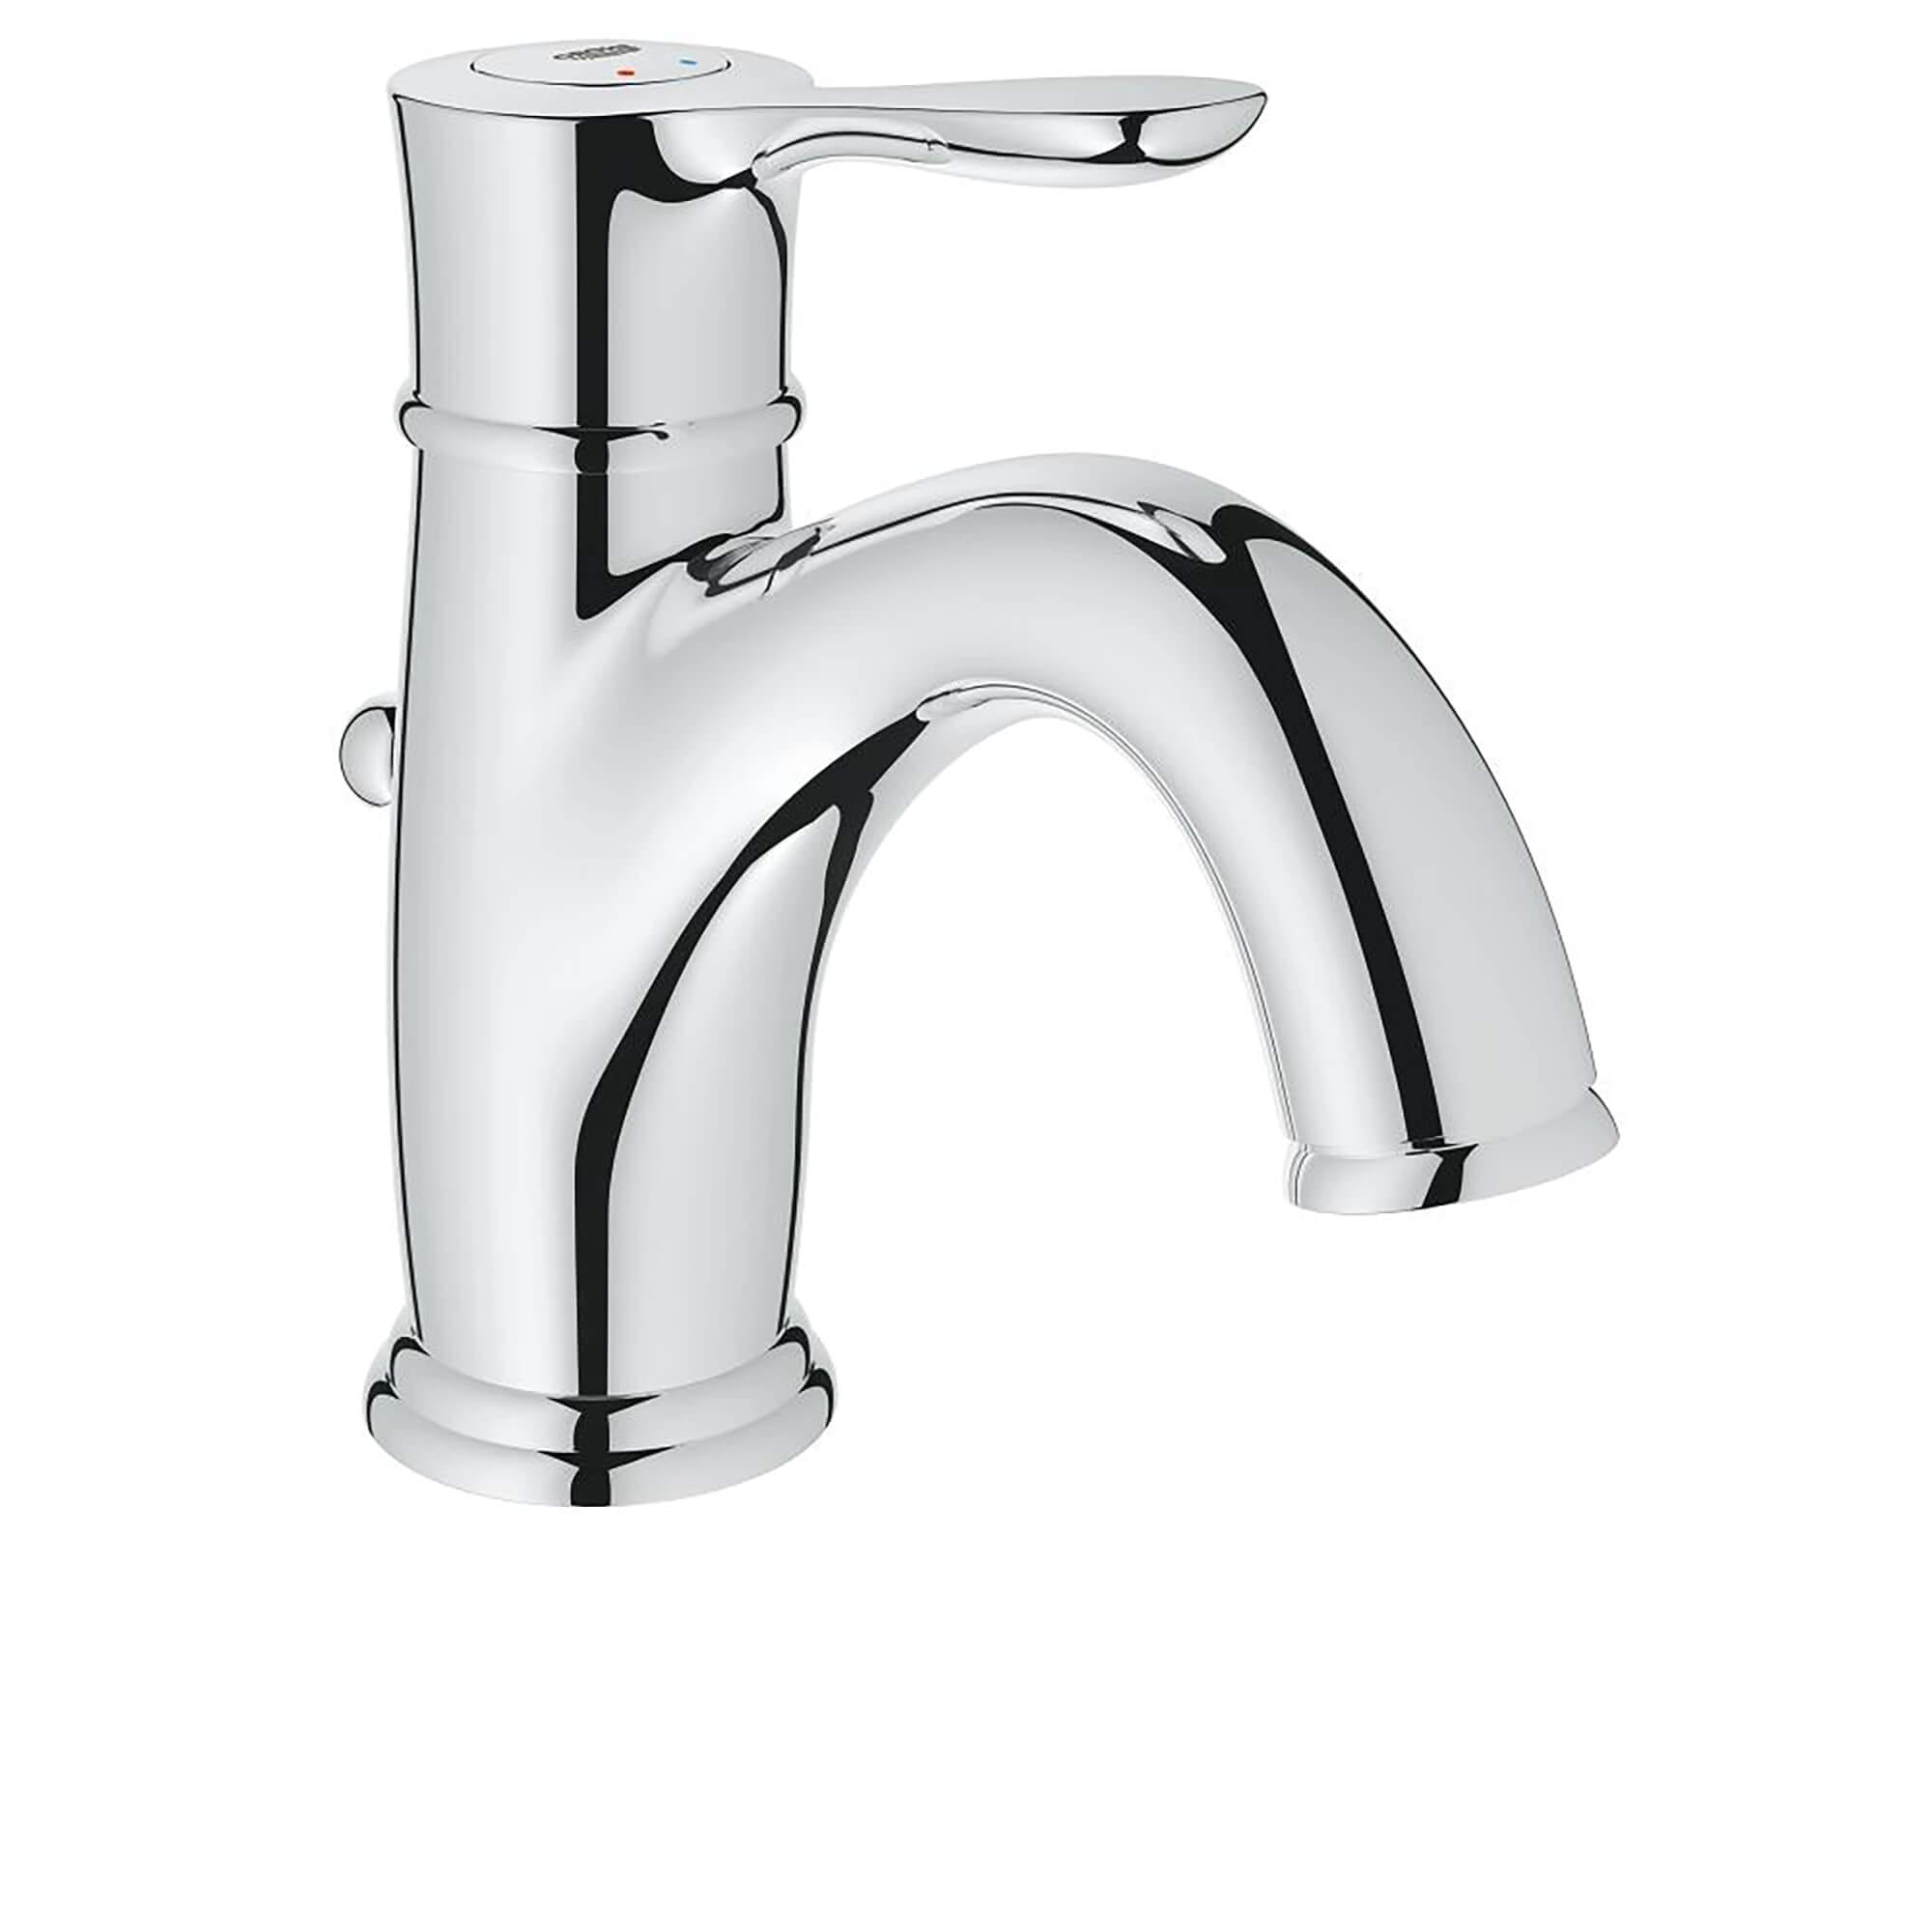 Centerset Single Handle Single Hole Bathroom Faucet   200.20 GPM